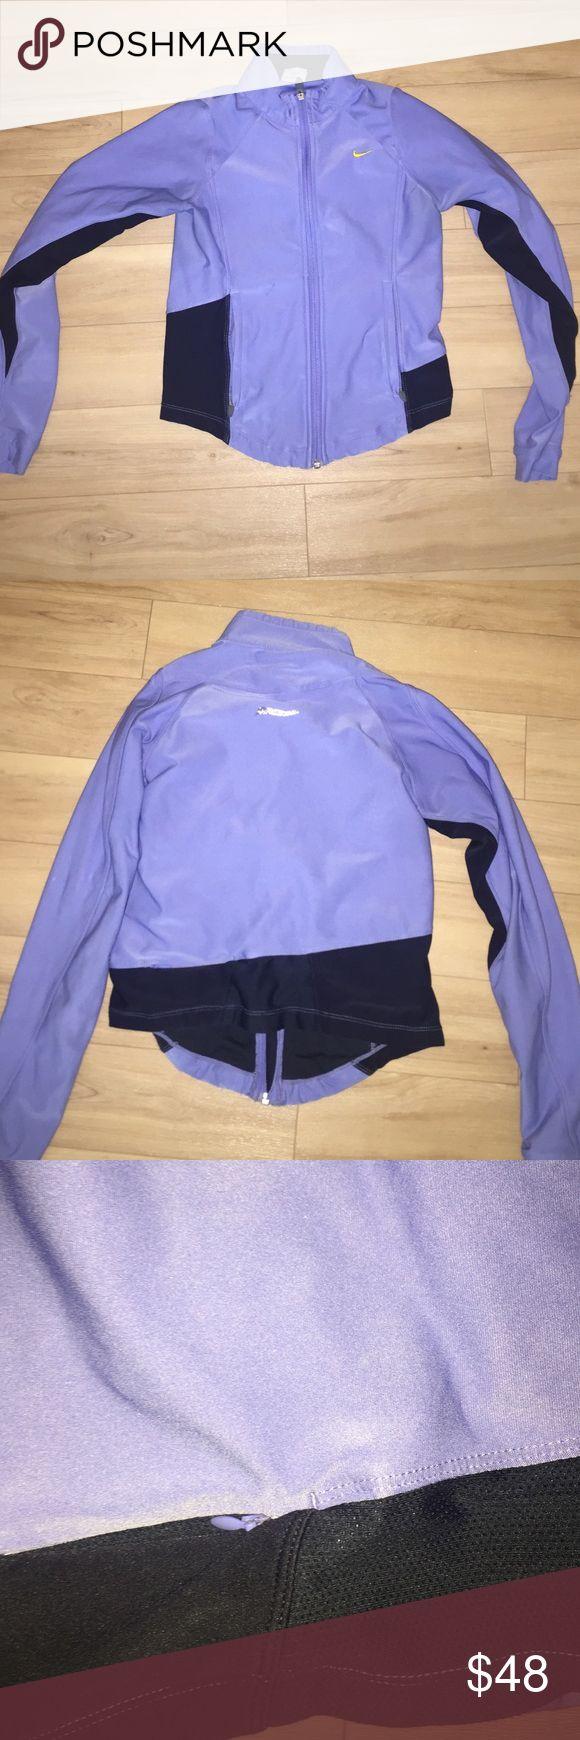 Nike dryfit running jacket Lavender blue Nike running jacket Nike Jackets & Coats